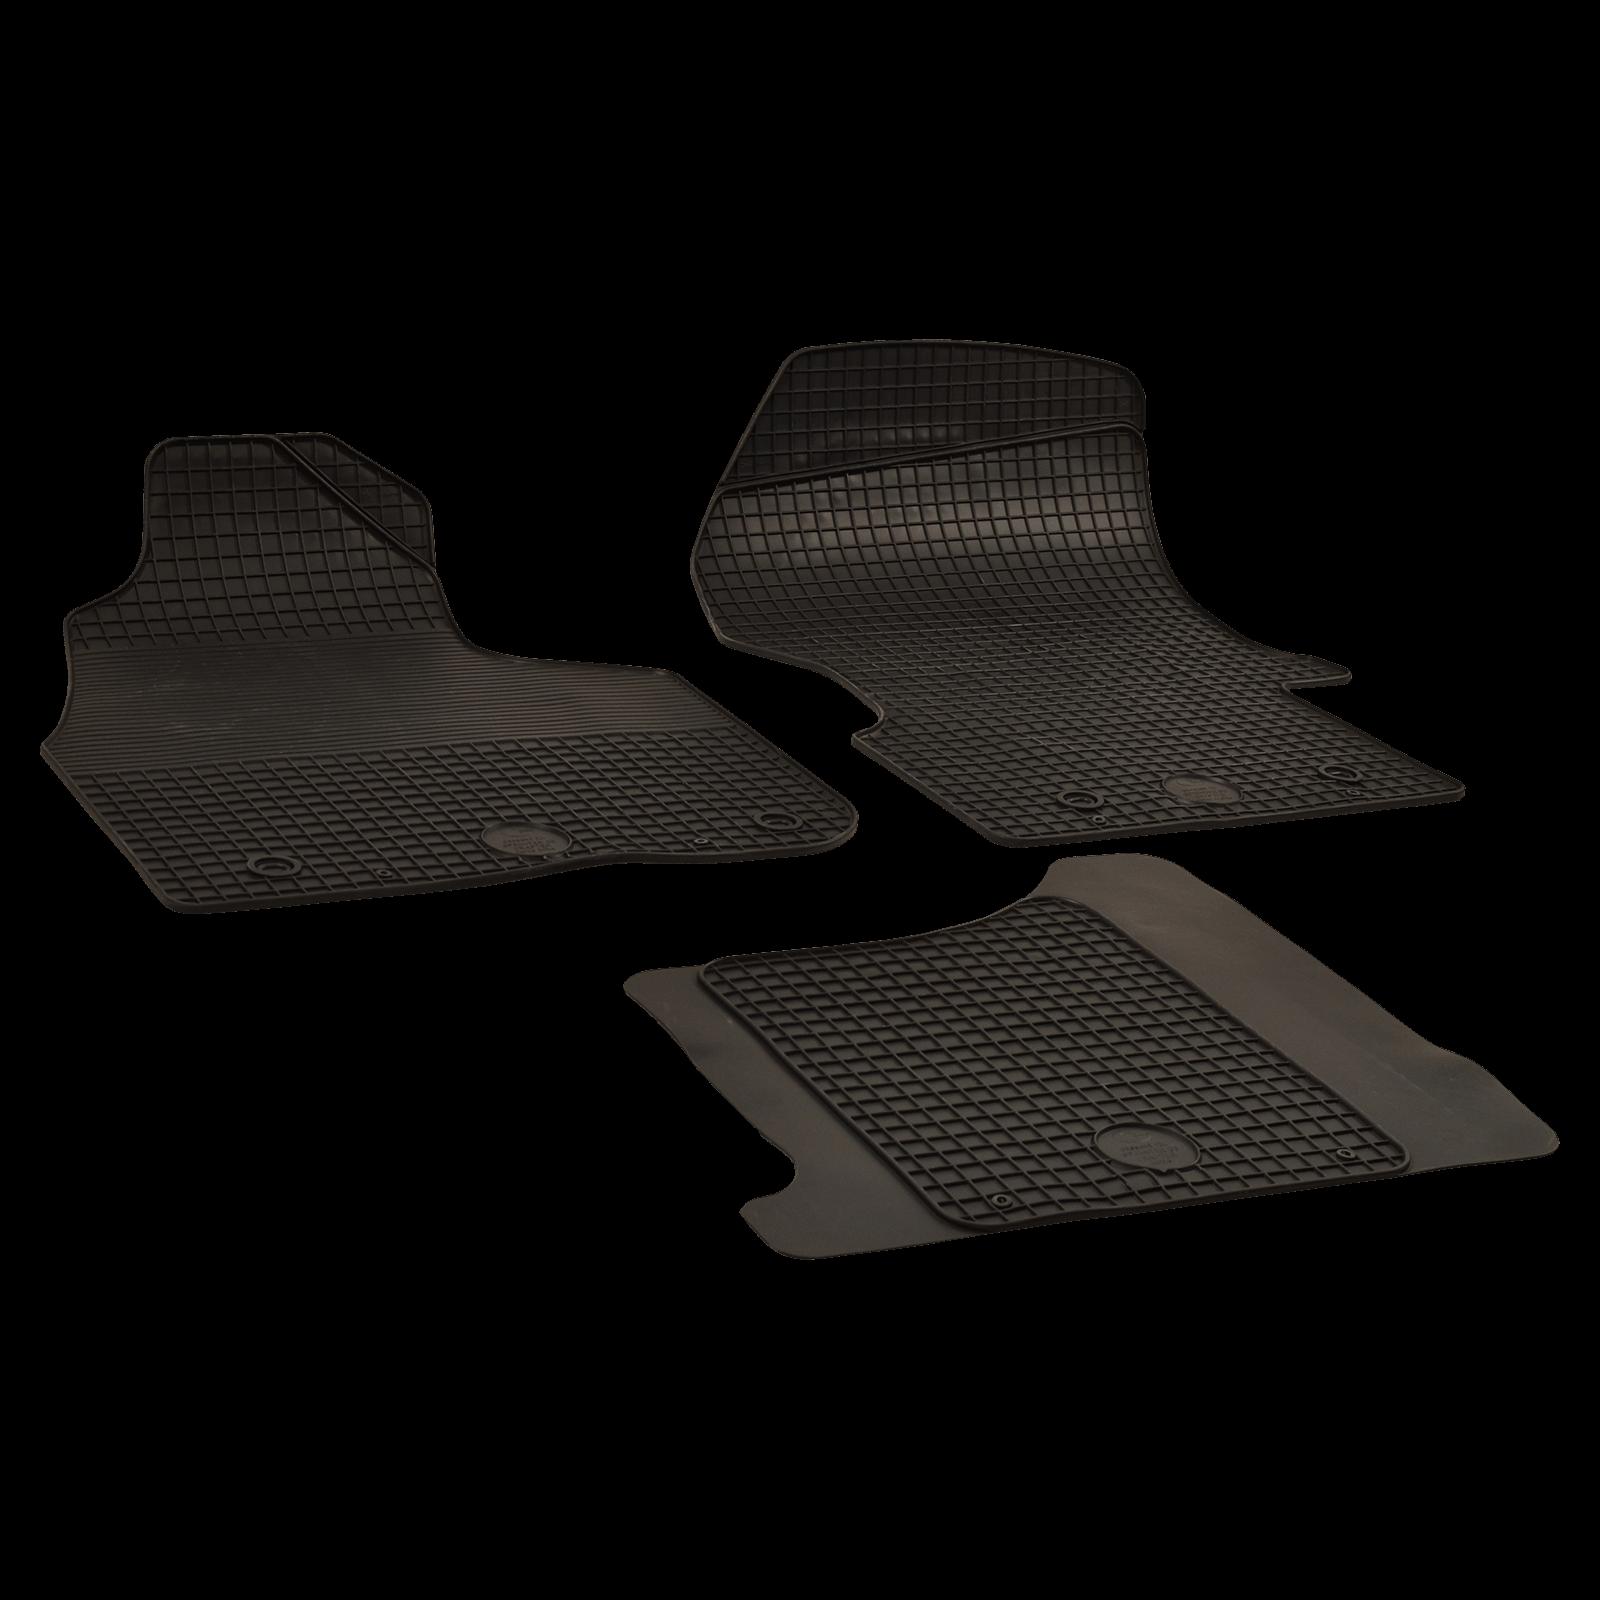 Rubber Floor Mats Black For Mercedes Benz Sprinter 3 T Bus Year Of Make 06 06